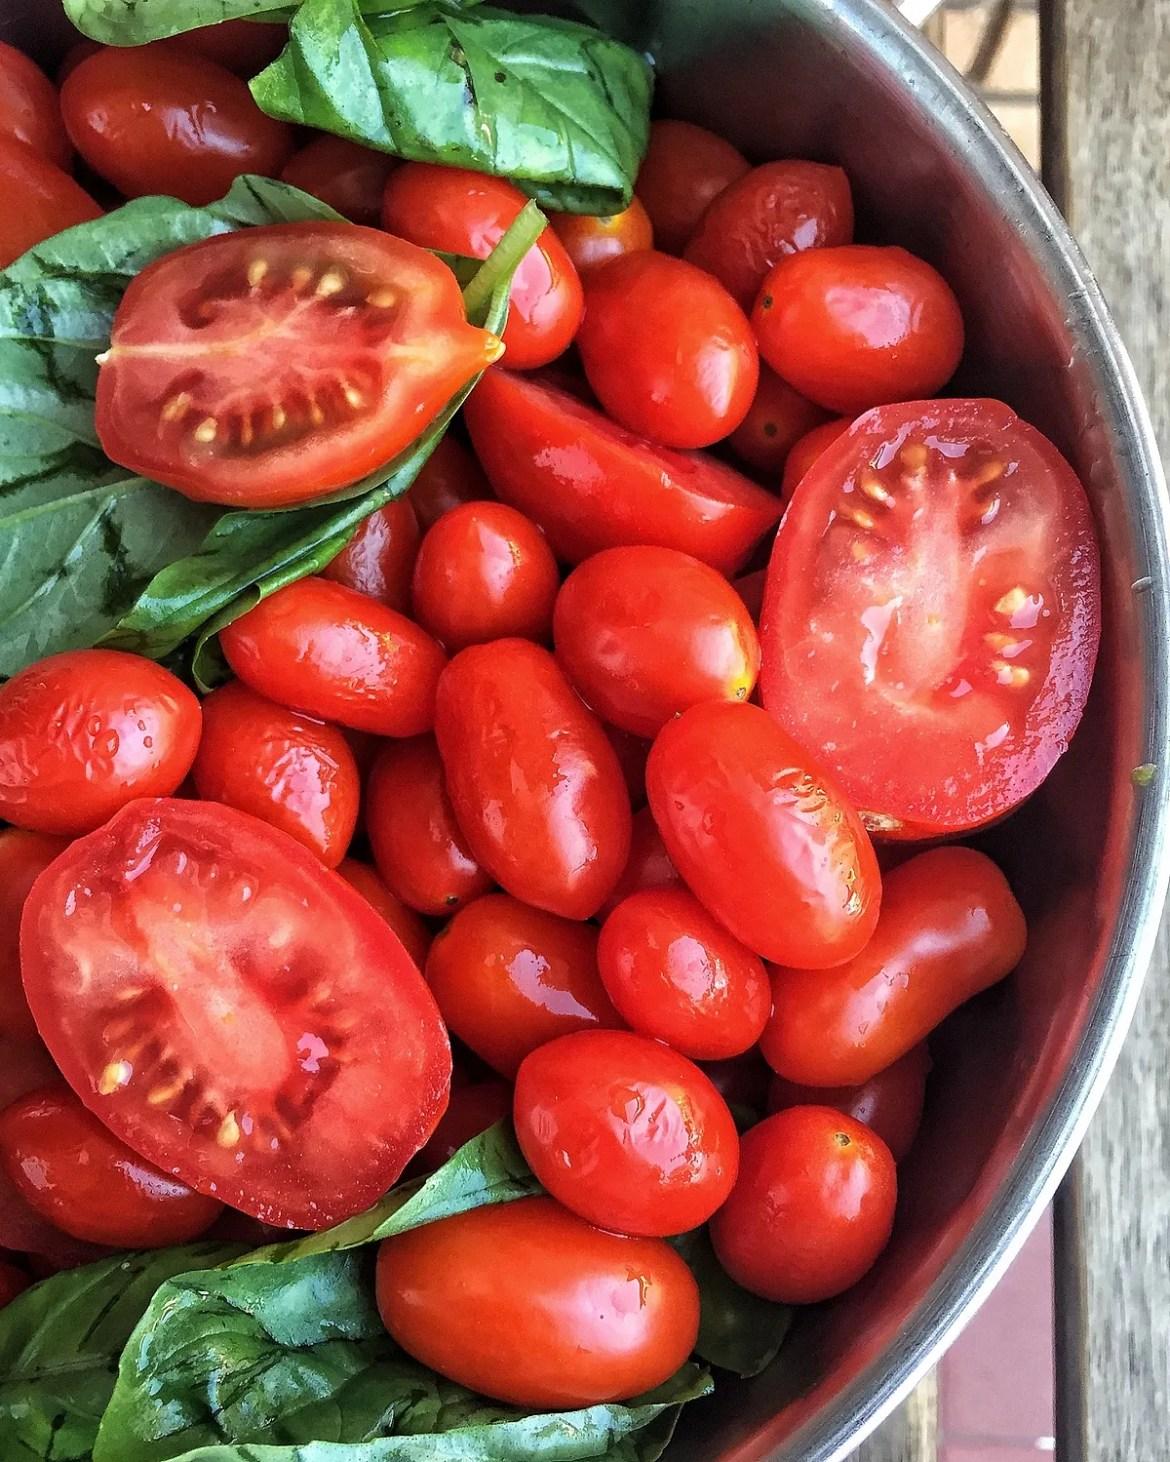 La salsa casera de tomate fresco